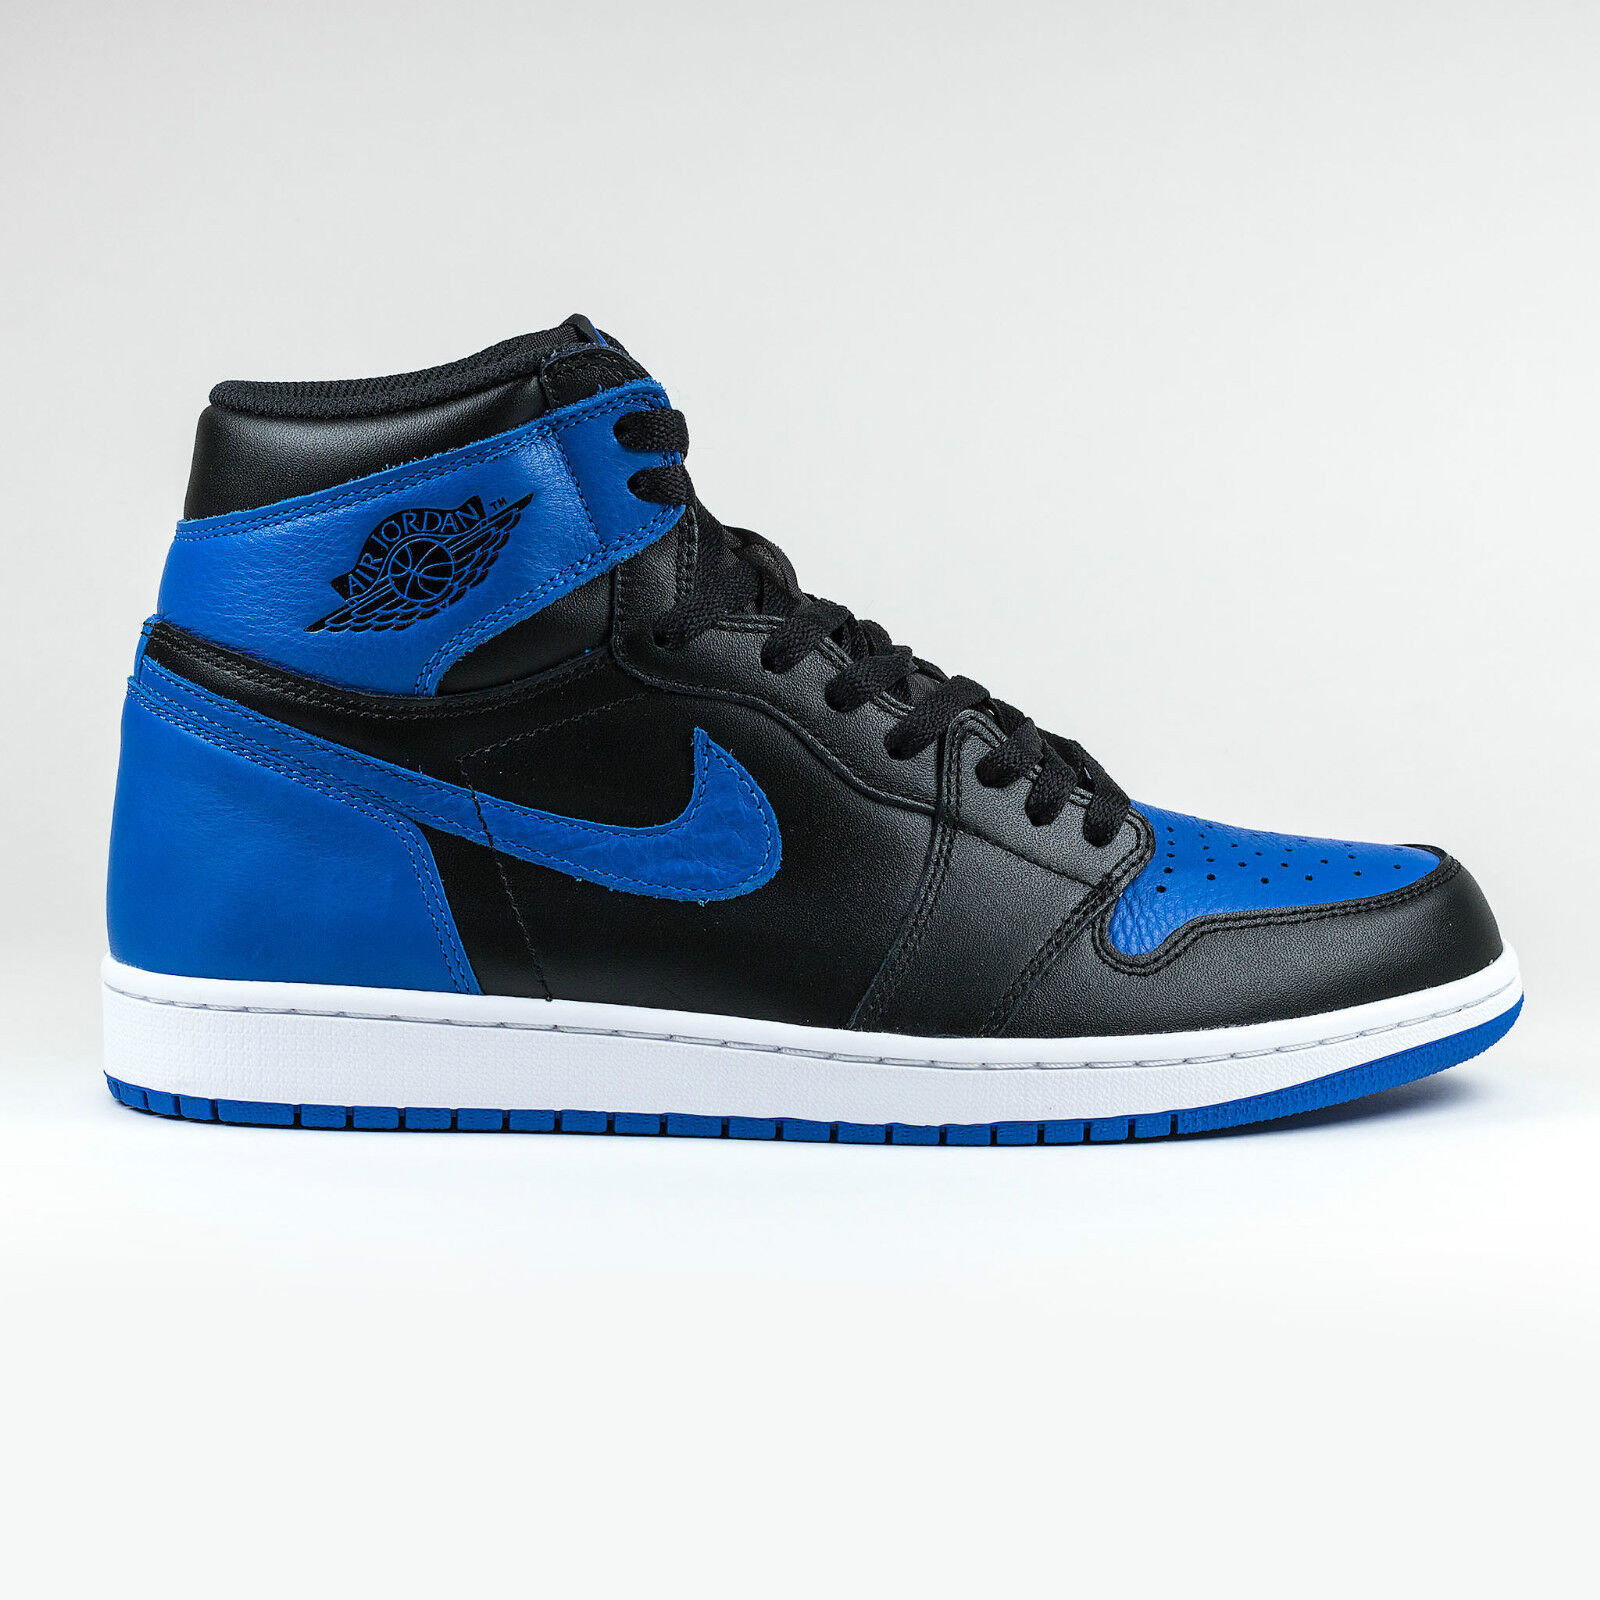 100% AUTH 2017 Air Jordan 1 ROYAL BLUE Breds Chicago Royal Blue 555088-007